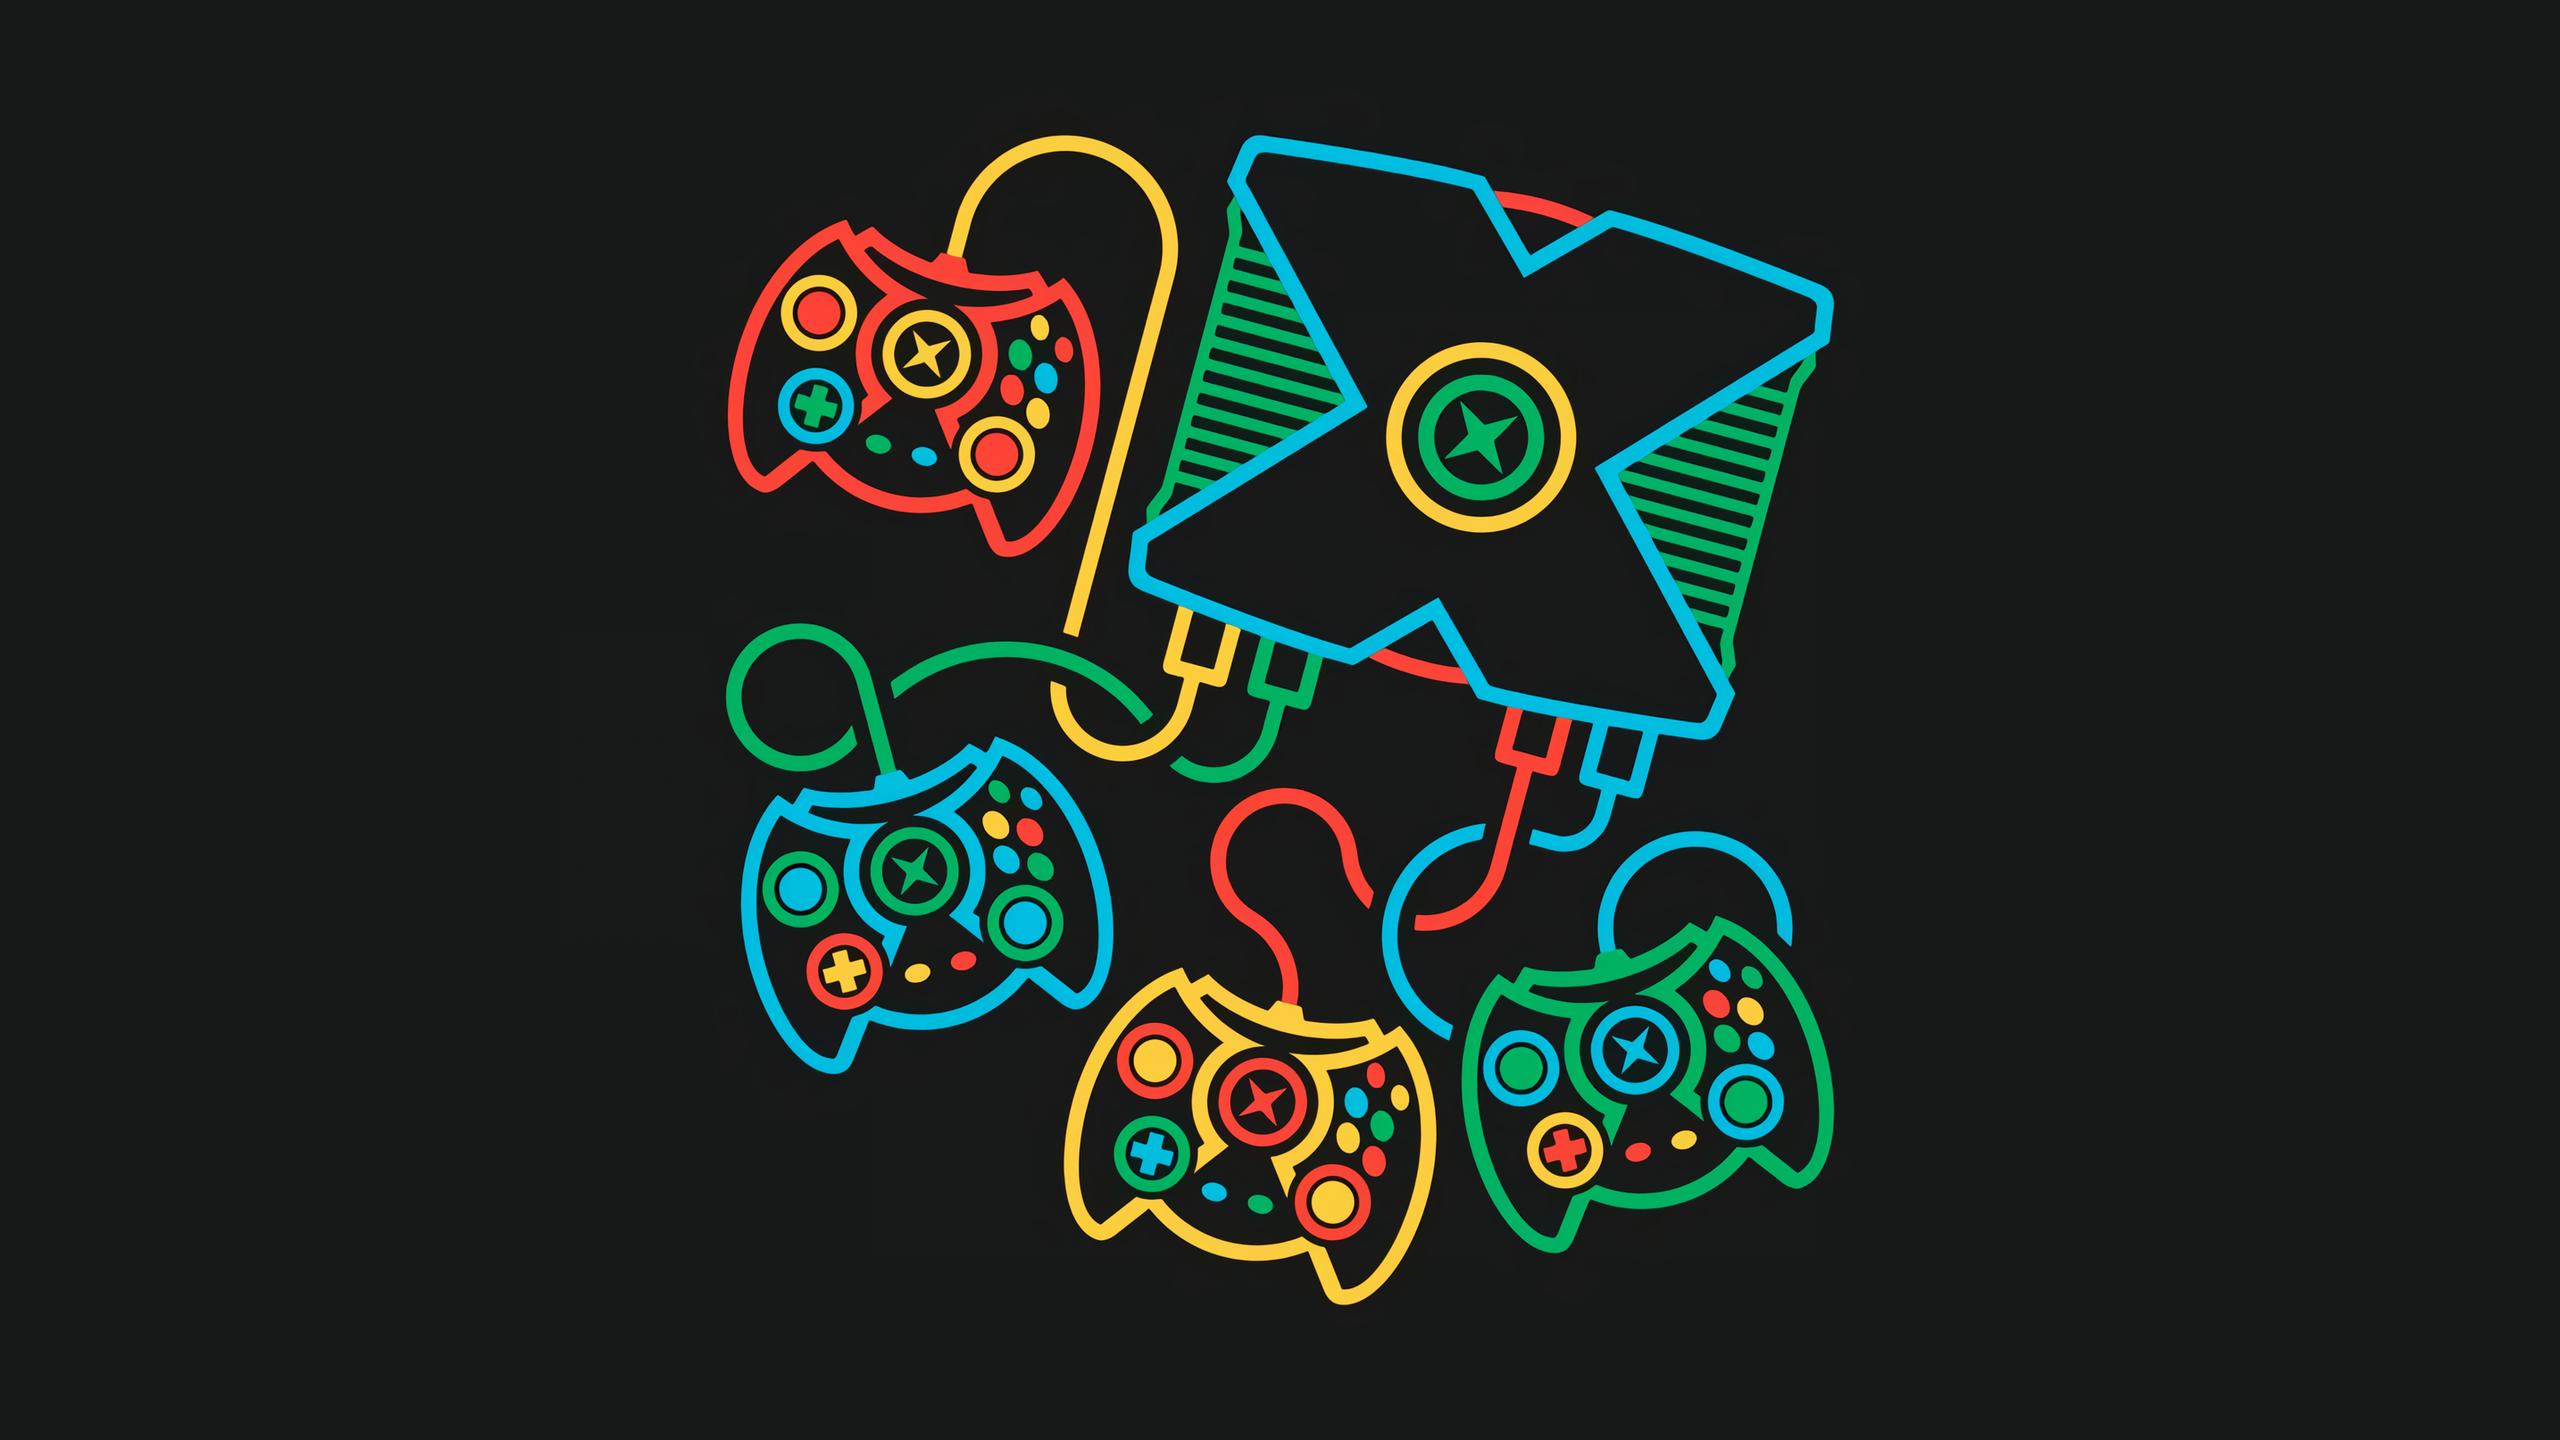 Xbox, retro games, minimalism, black background